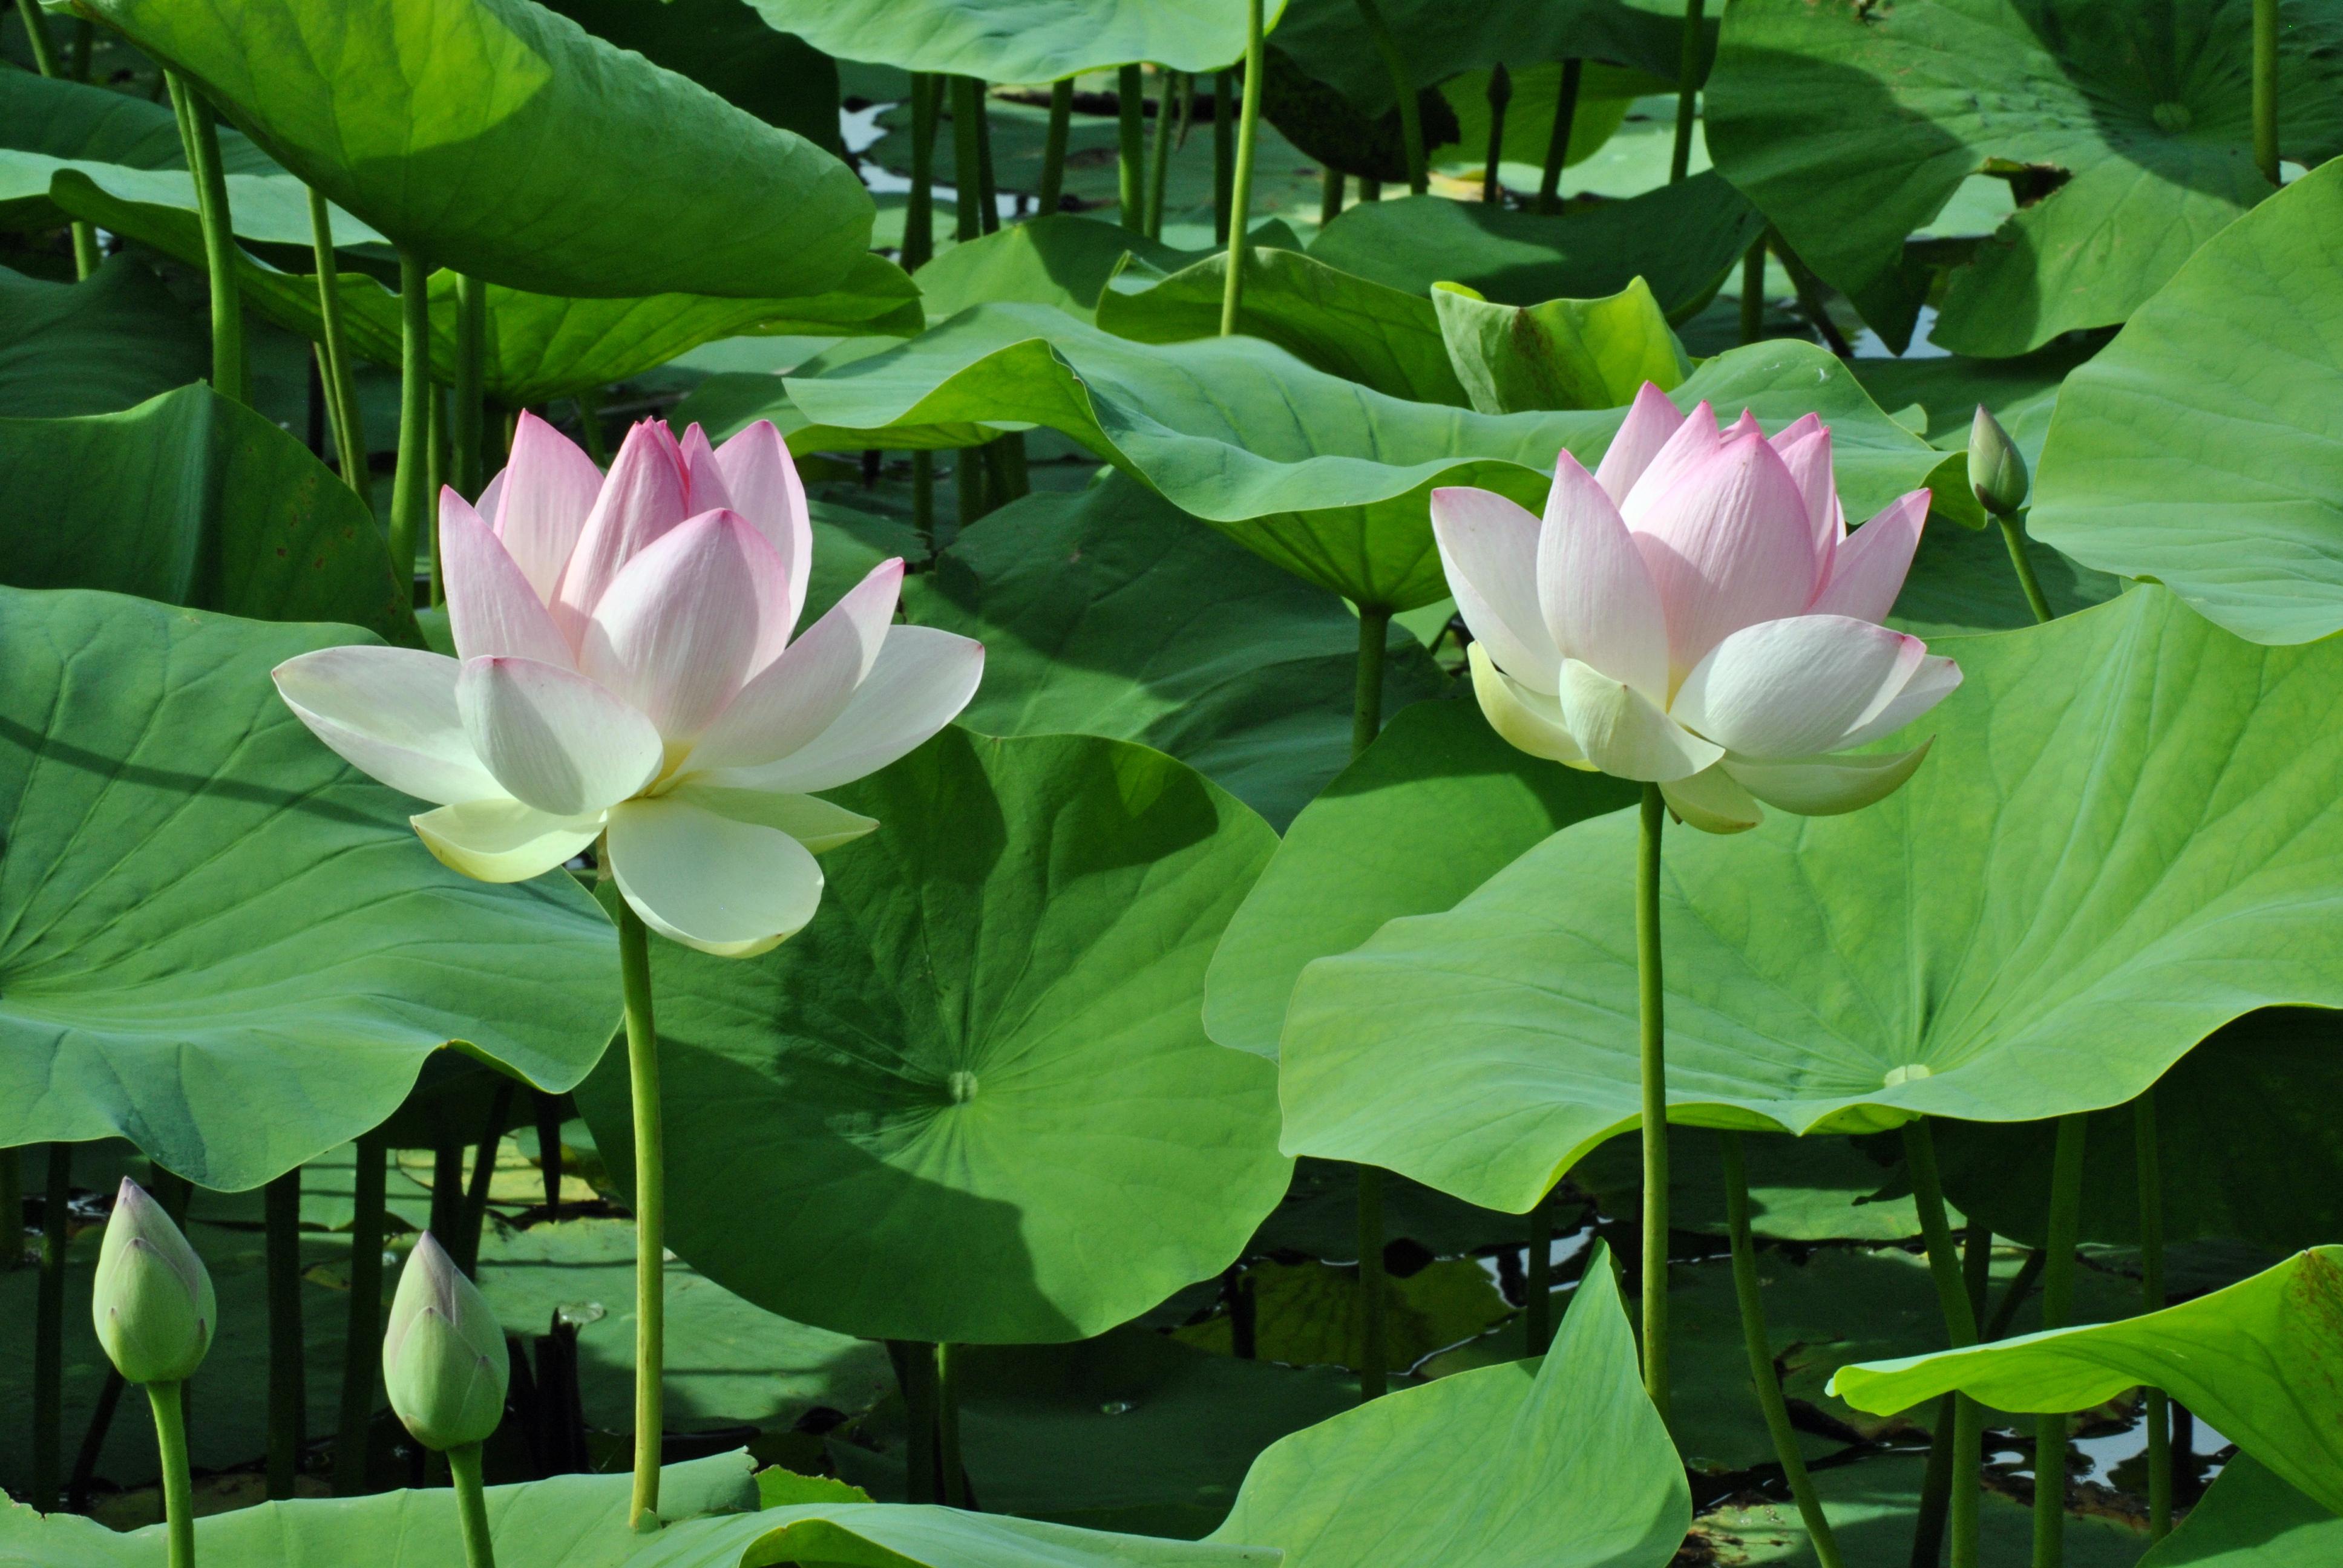 Free photo lotus flower peace oval petals non commercial lotus flower nelumbo by kordouane photography flowersplants mightylinksfo